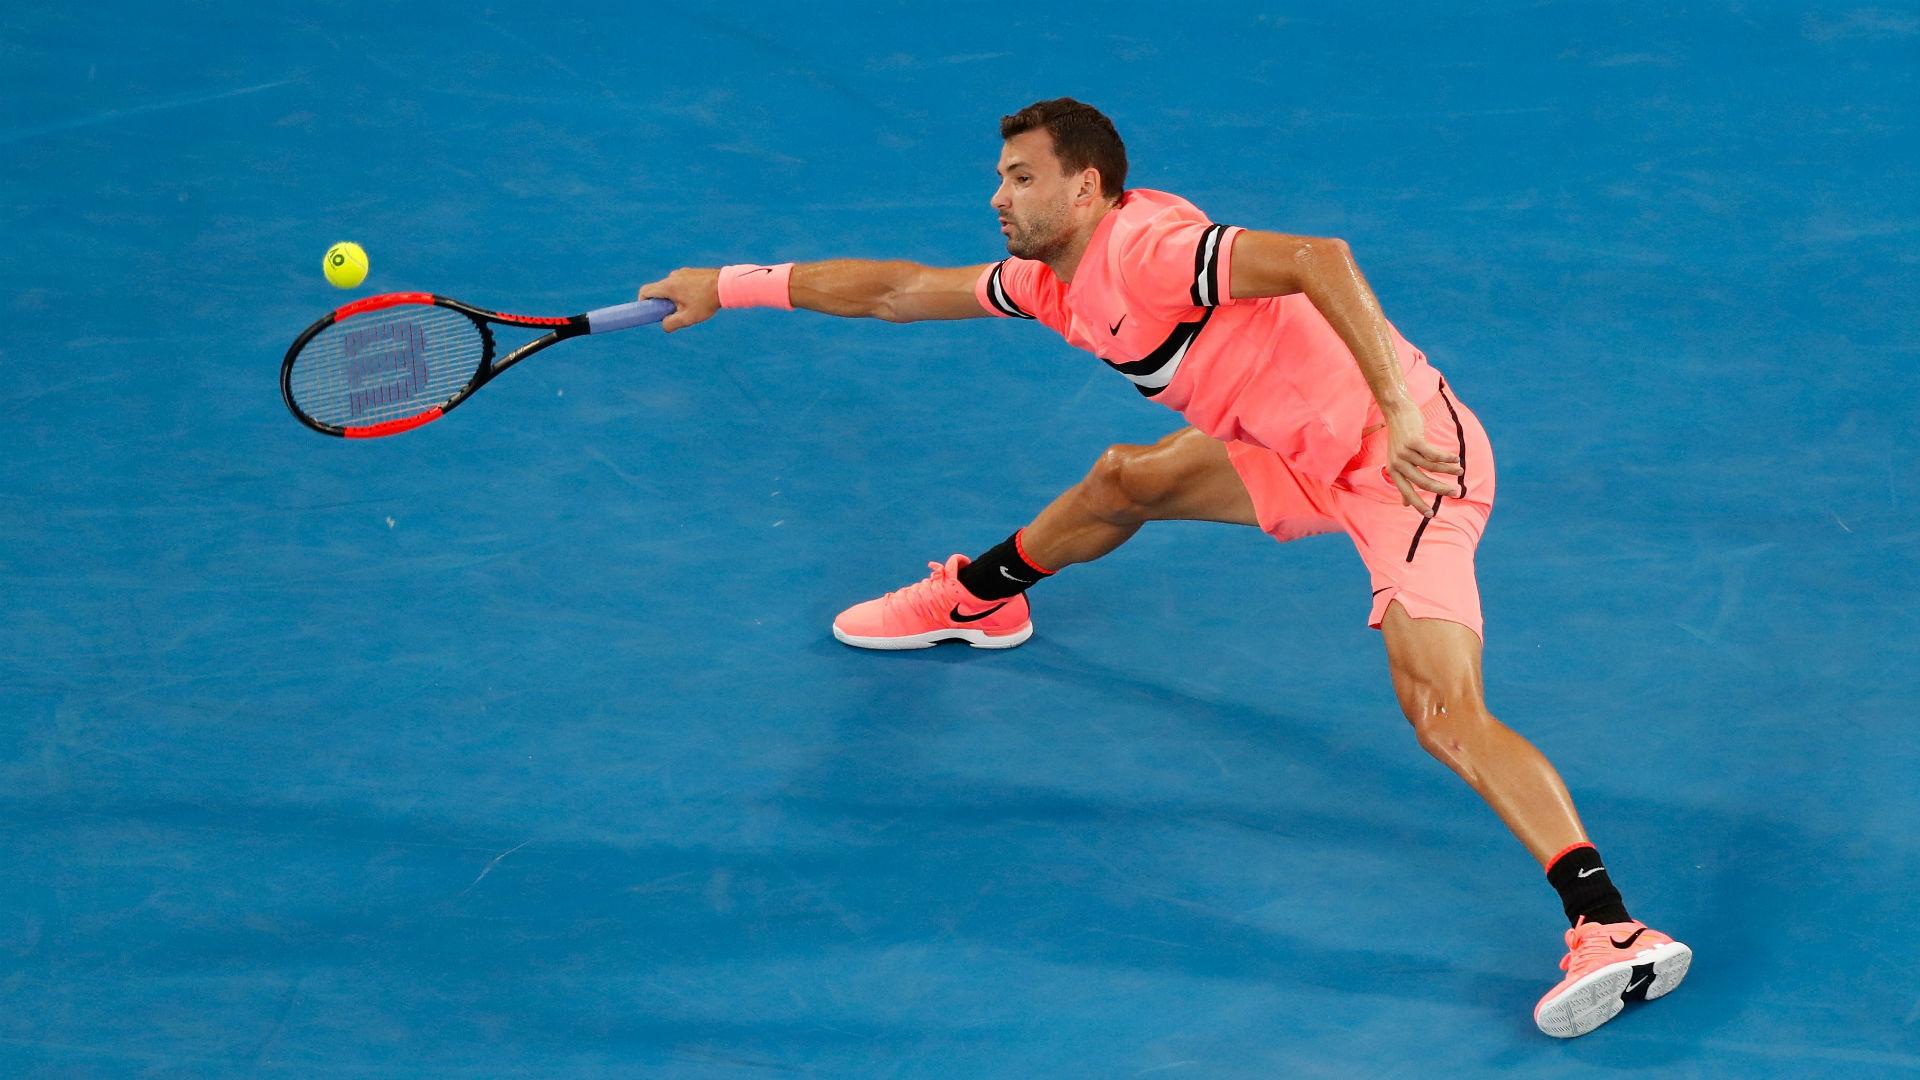 Australian Open: Relieved Grigor Dimitrov Survives Huge Five-Set Scare